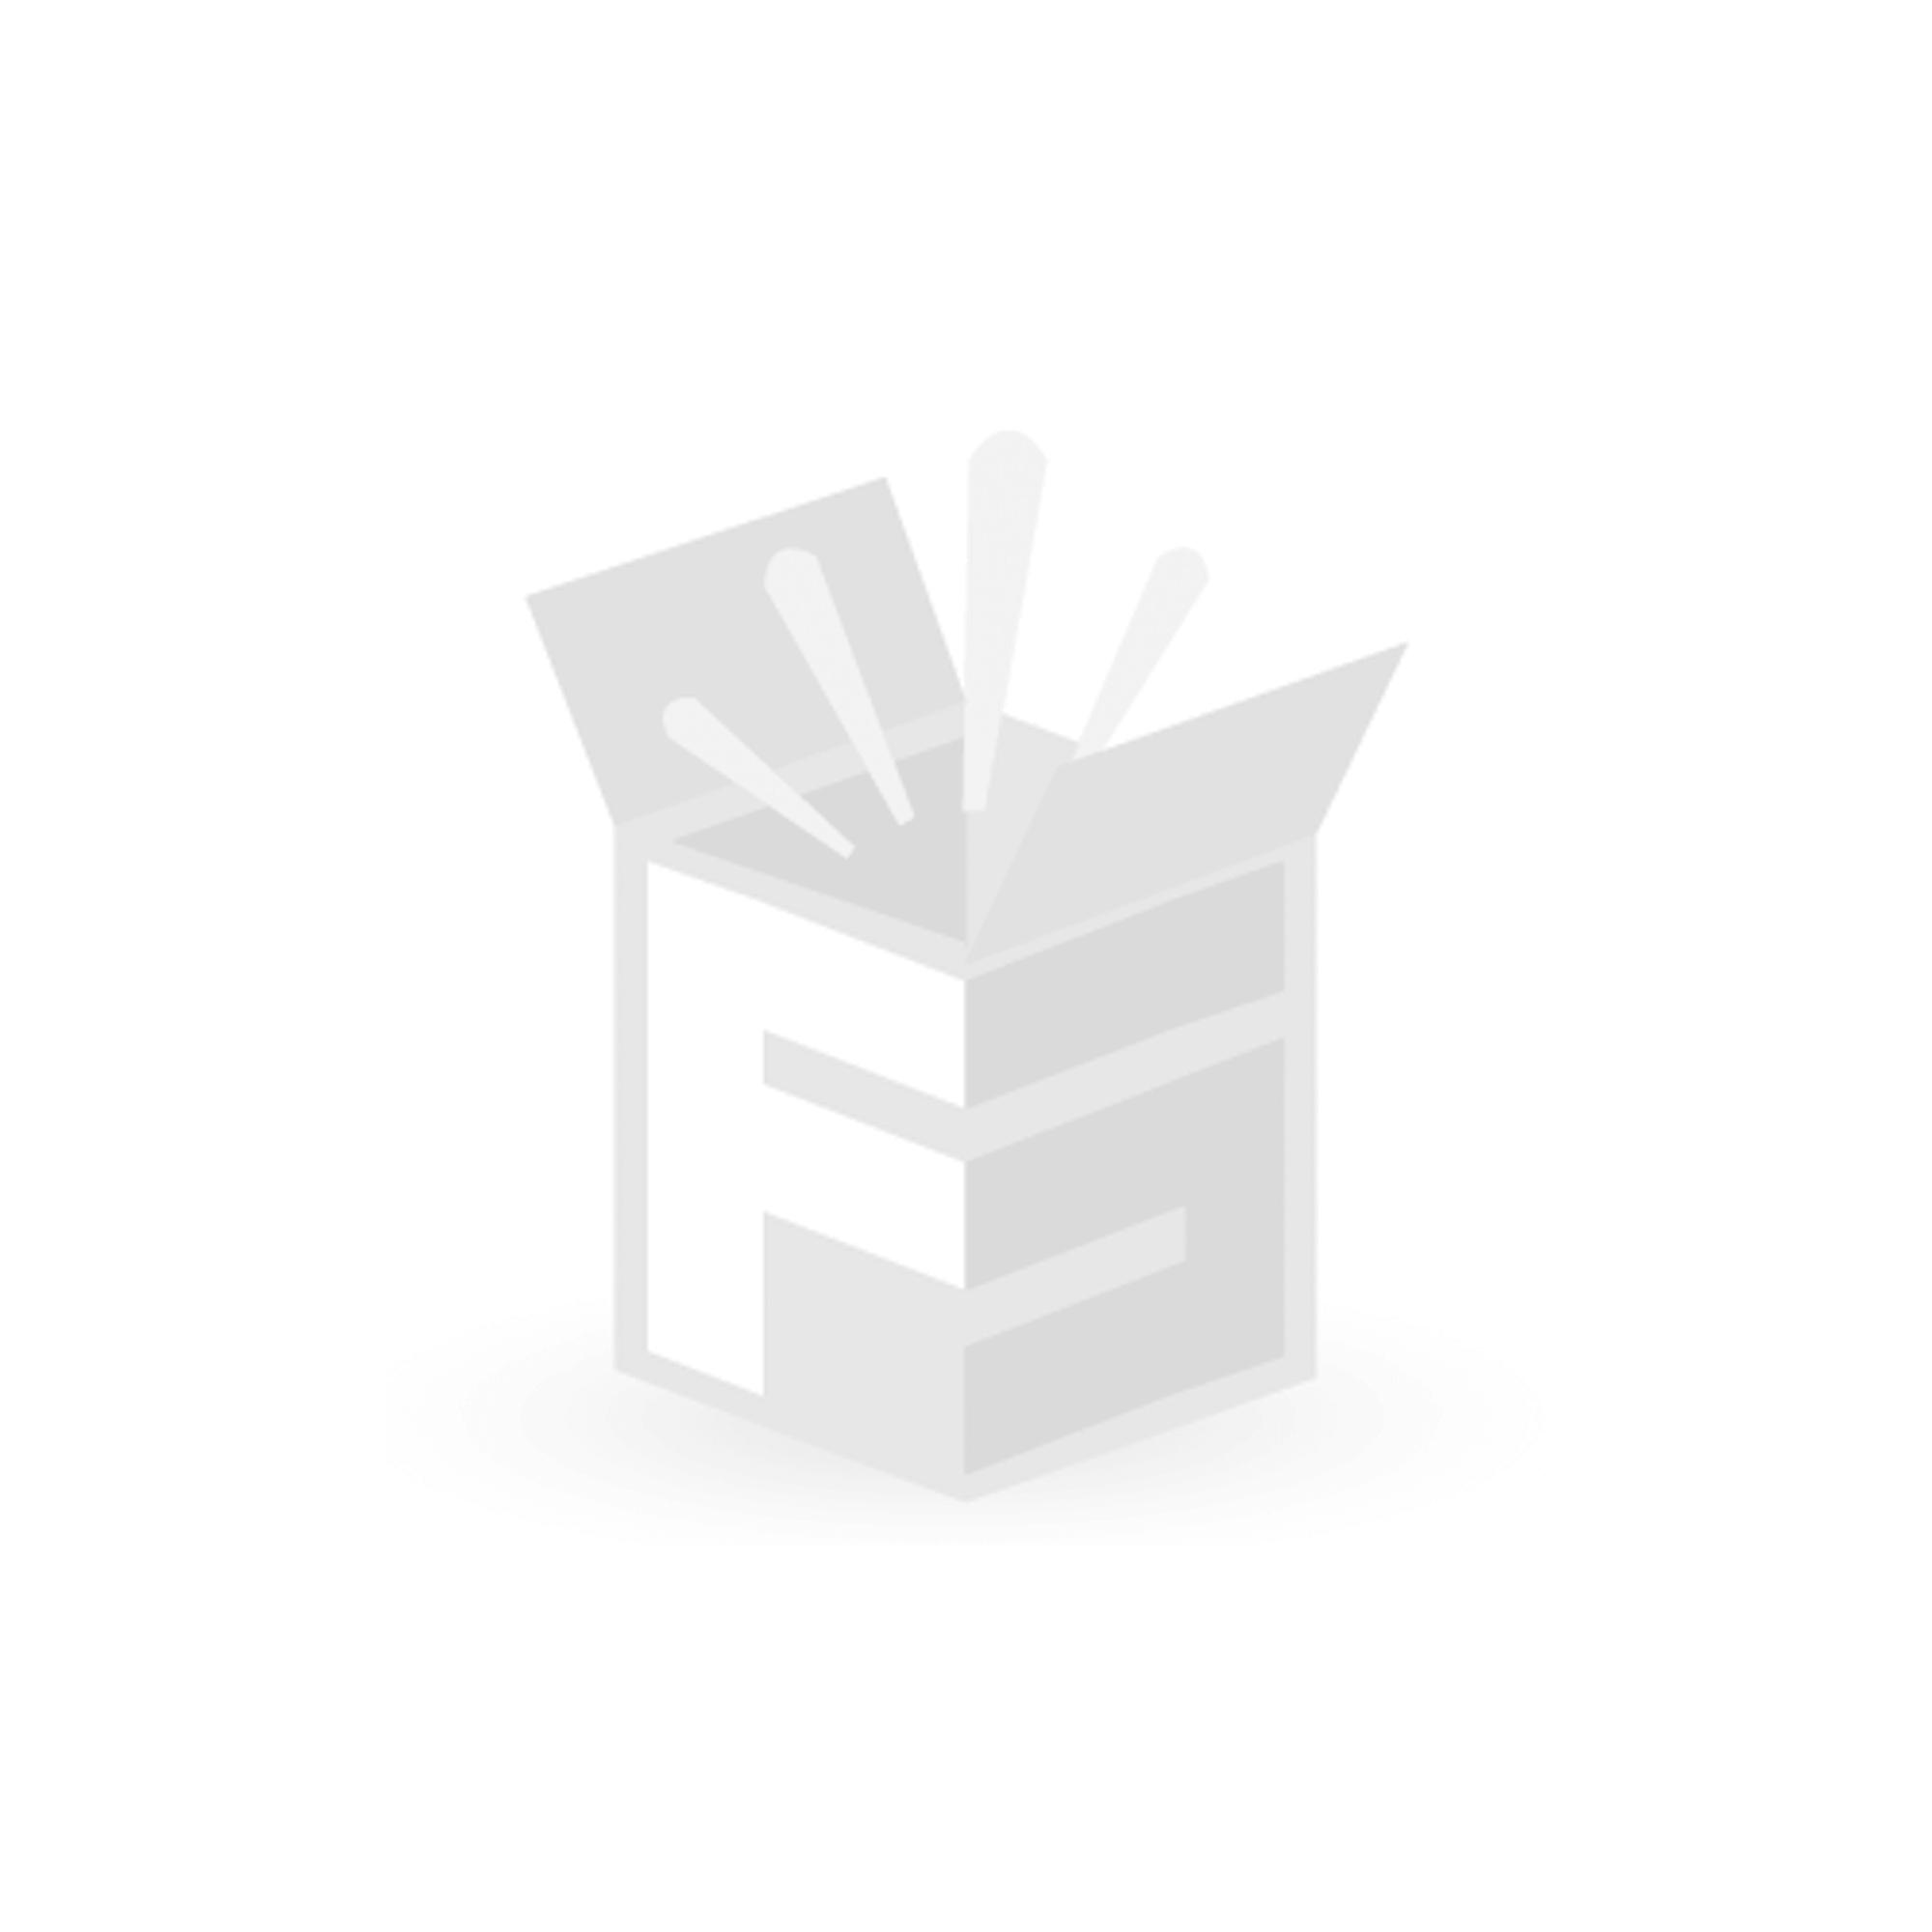 Kibernetik Briefkasten Swiss Norm, Metall